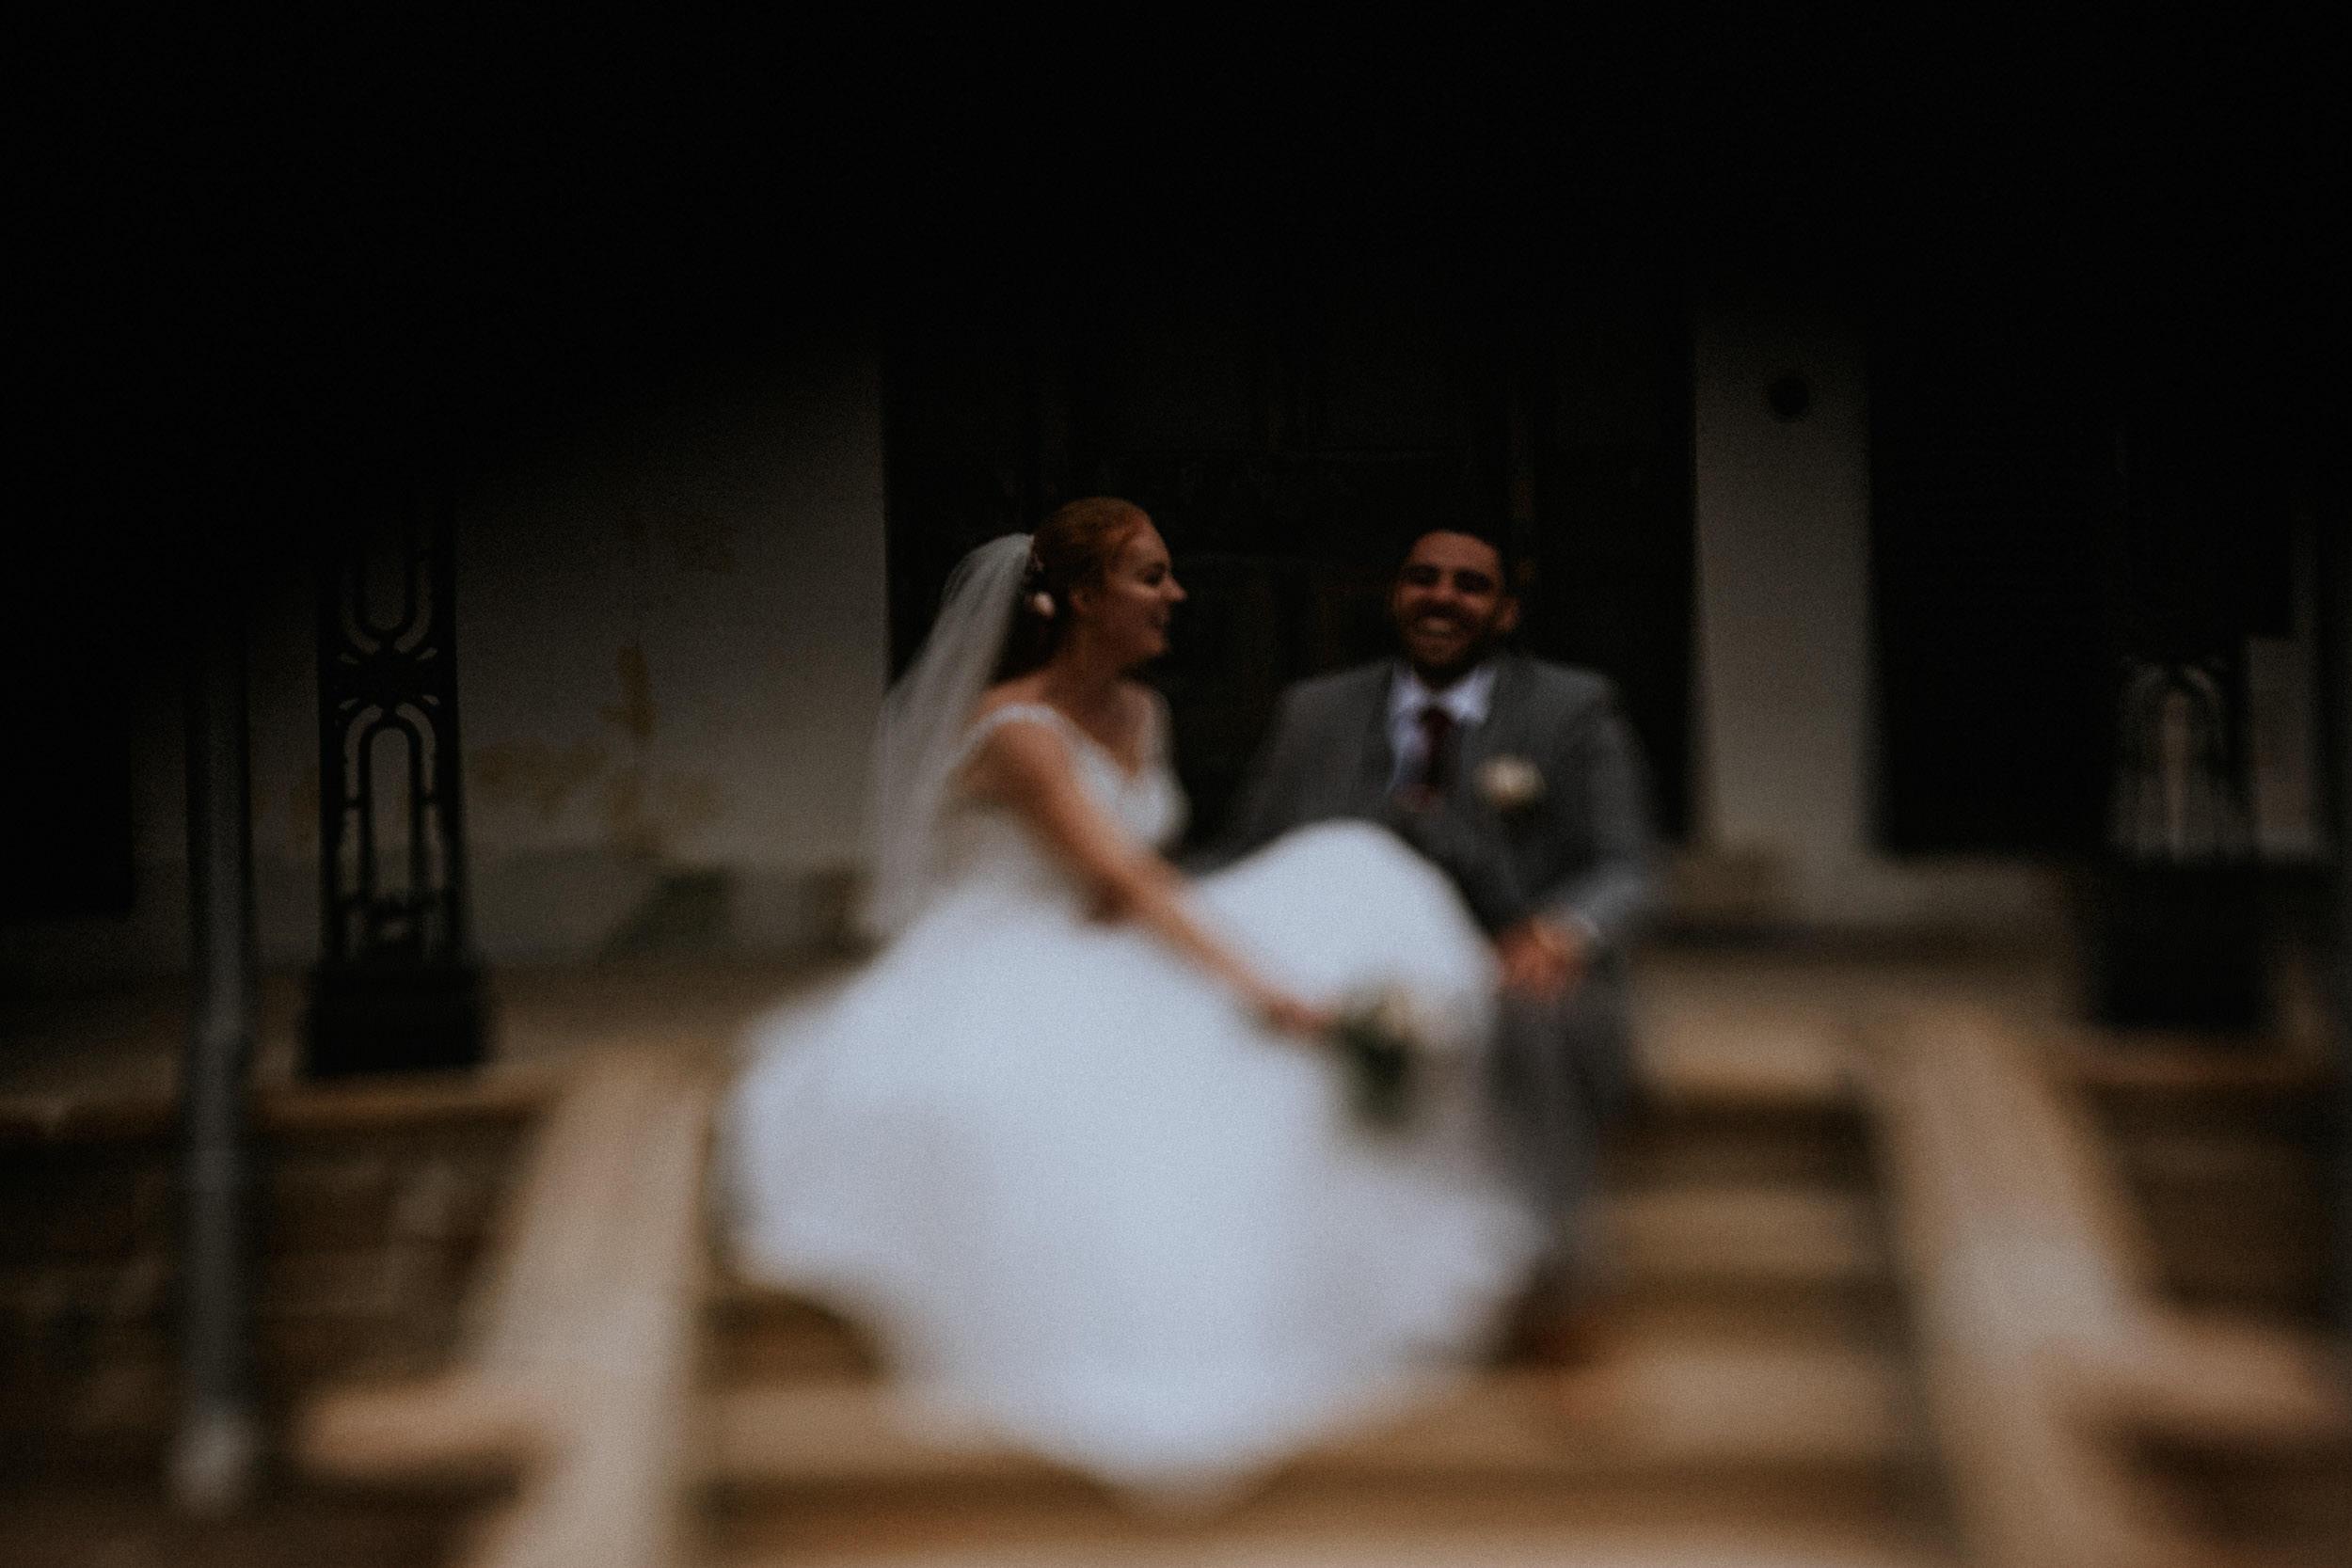 sav & mike_elopement wedding photography_kings & thieves_blog (9 of 44).jpg